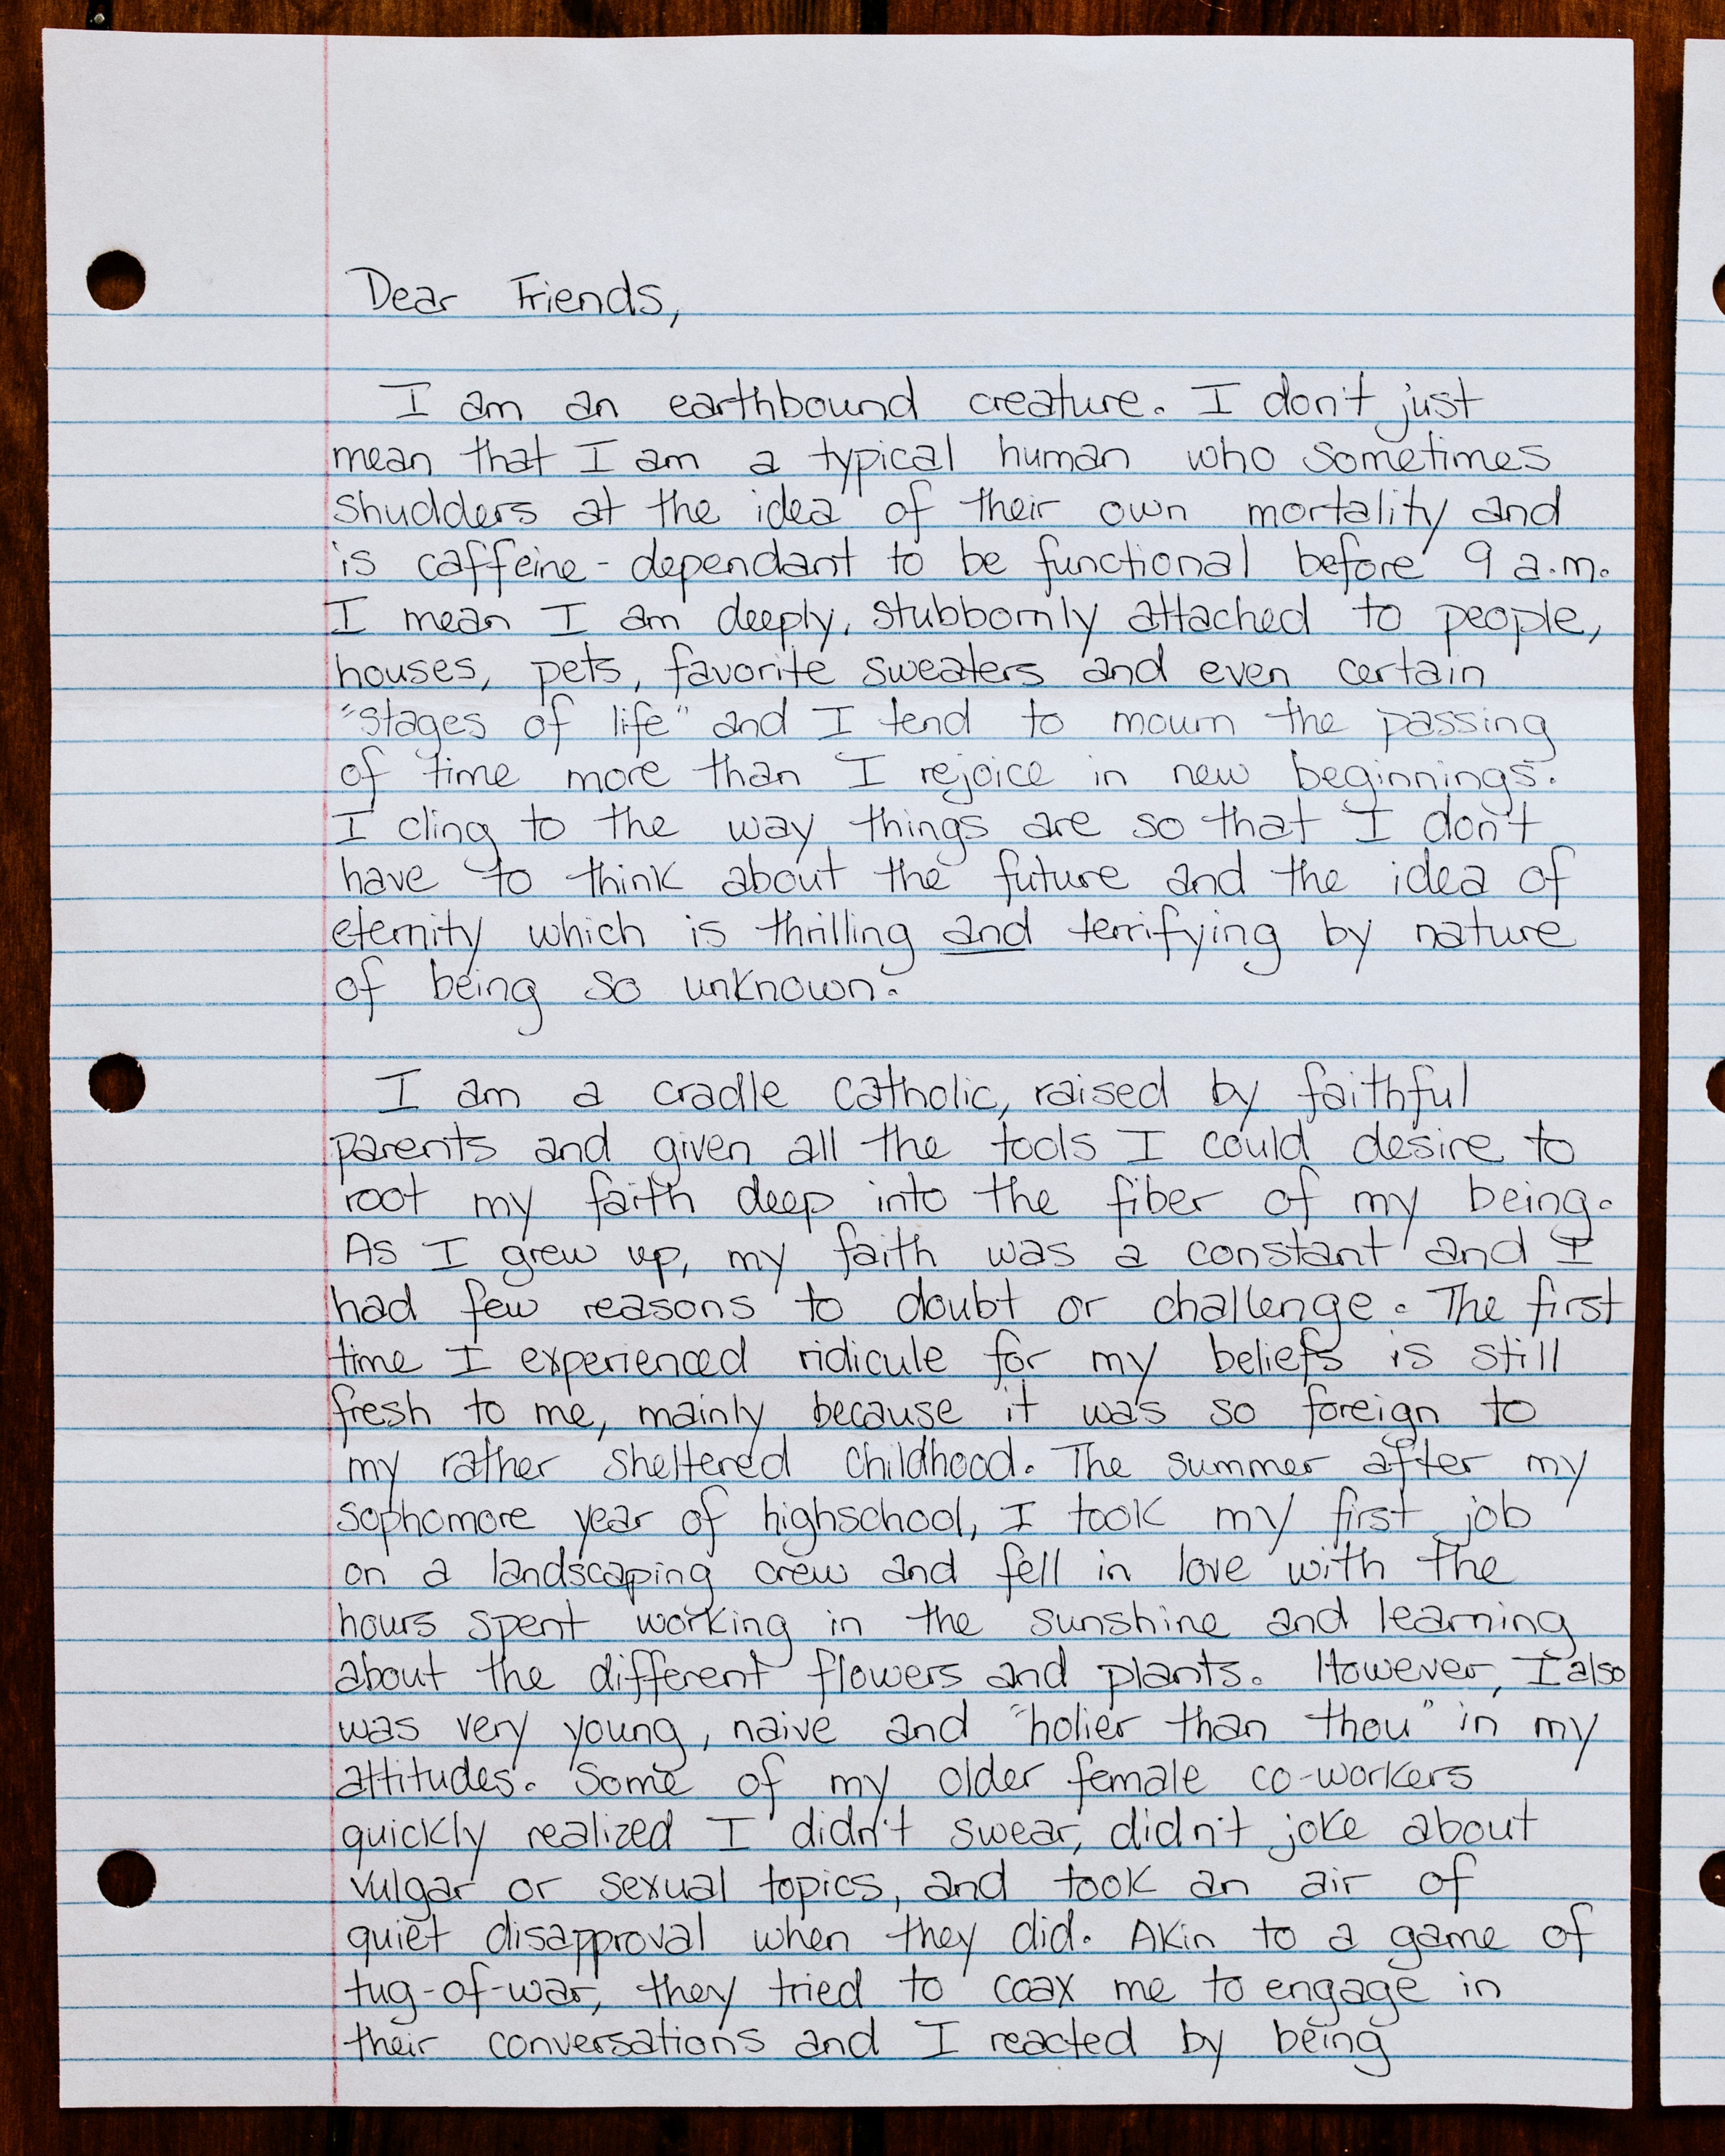 Maura Barnes The Catholic Woman Letter to Women 1